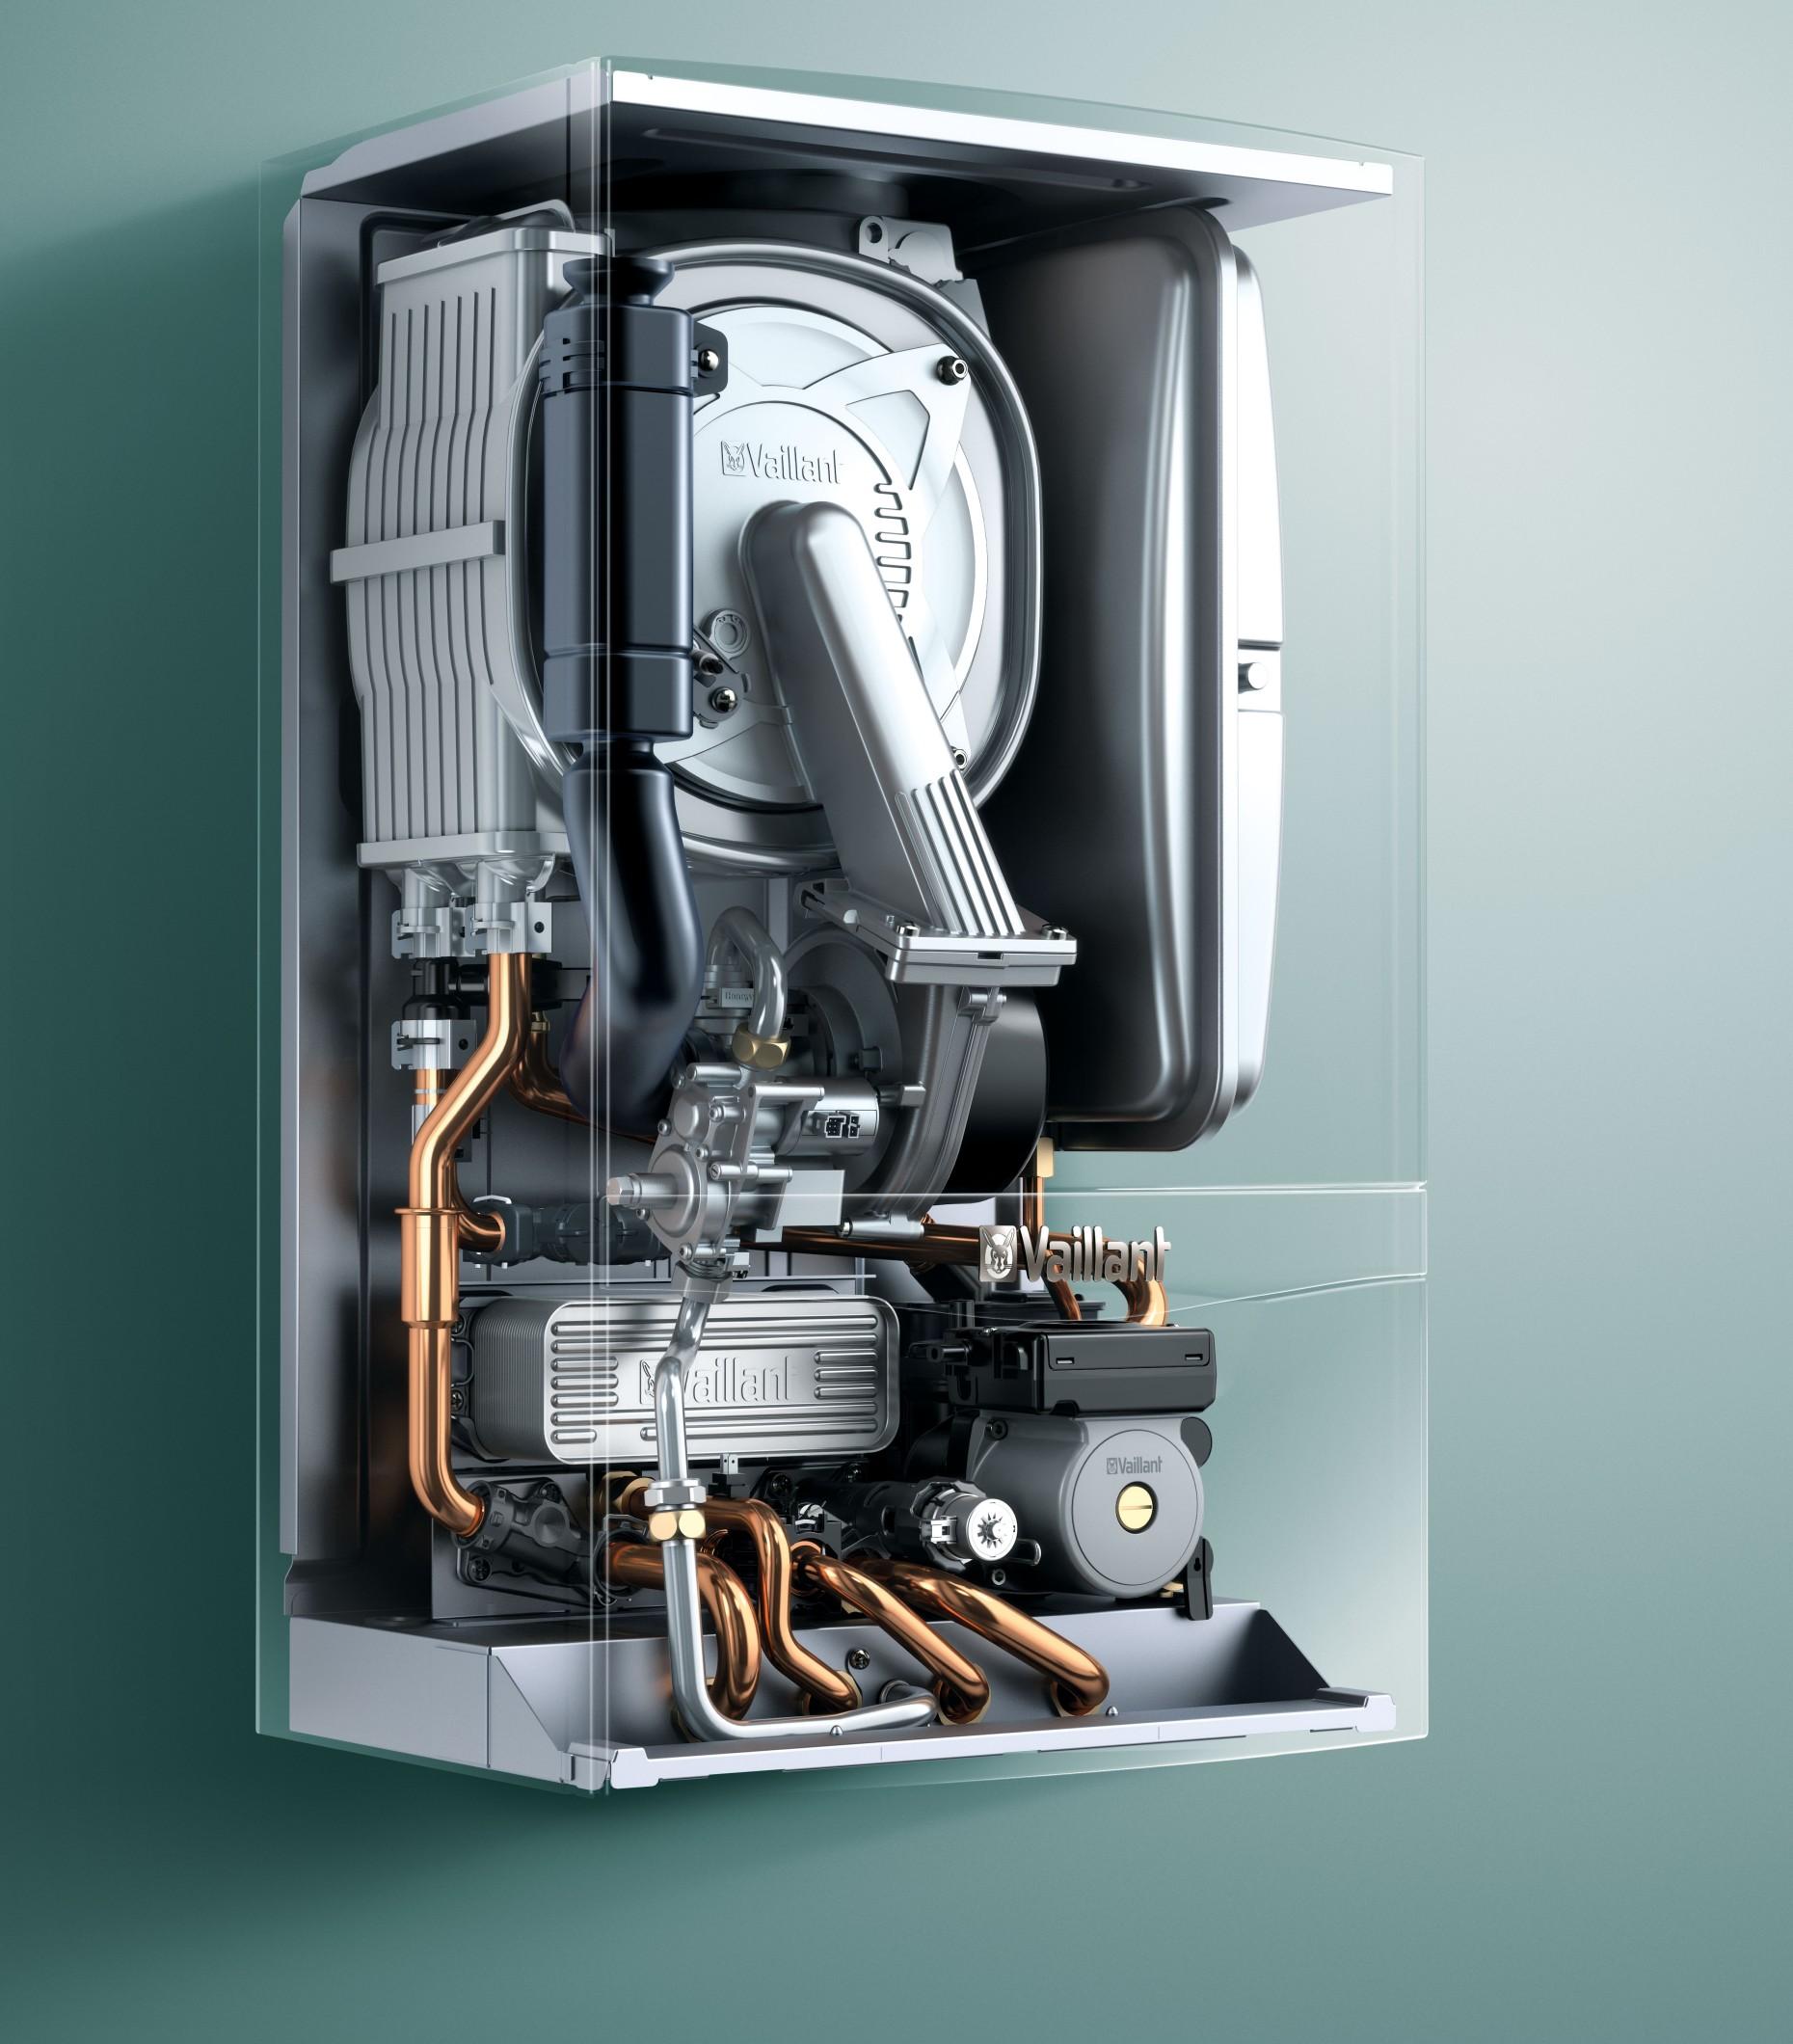 kondenzacijski kombinirani plinski bojler vaillant. Black Bedroom Furniture Sets. Home Design Ideas